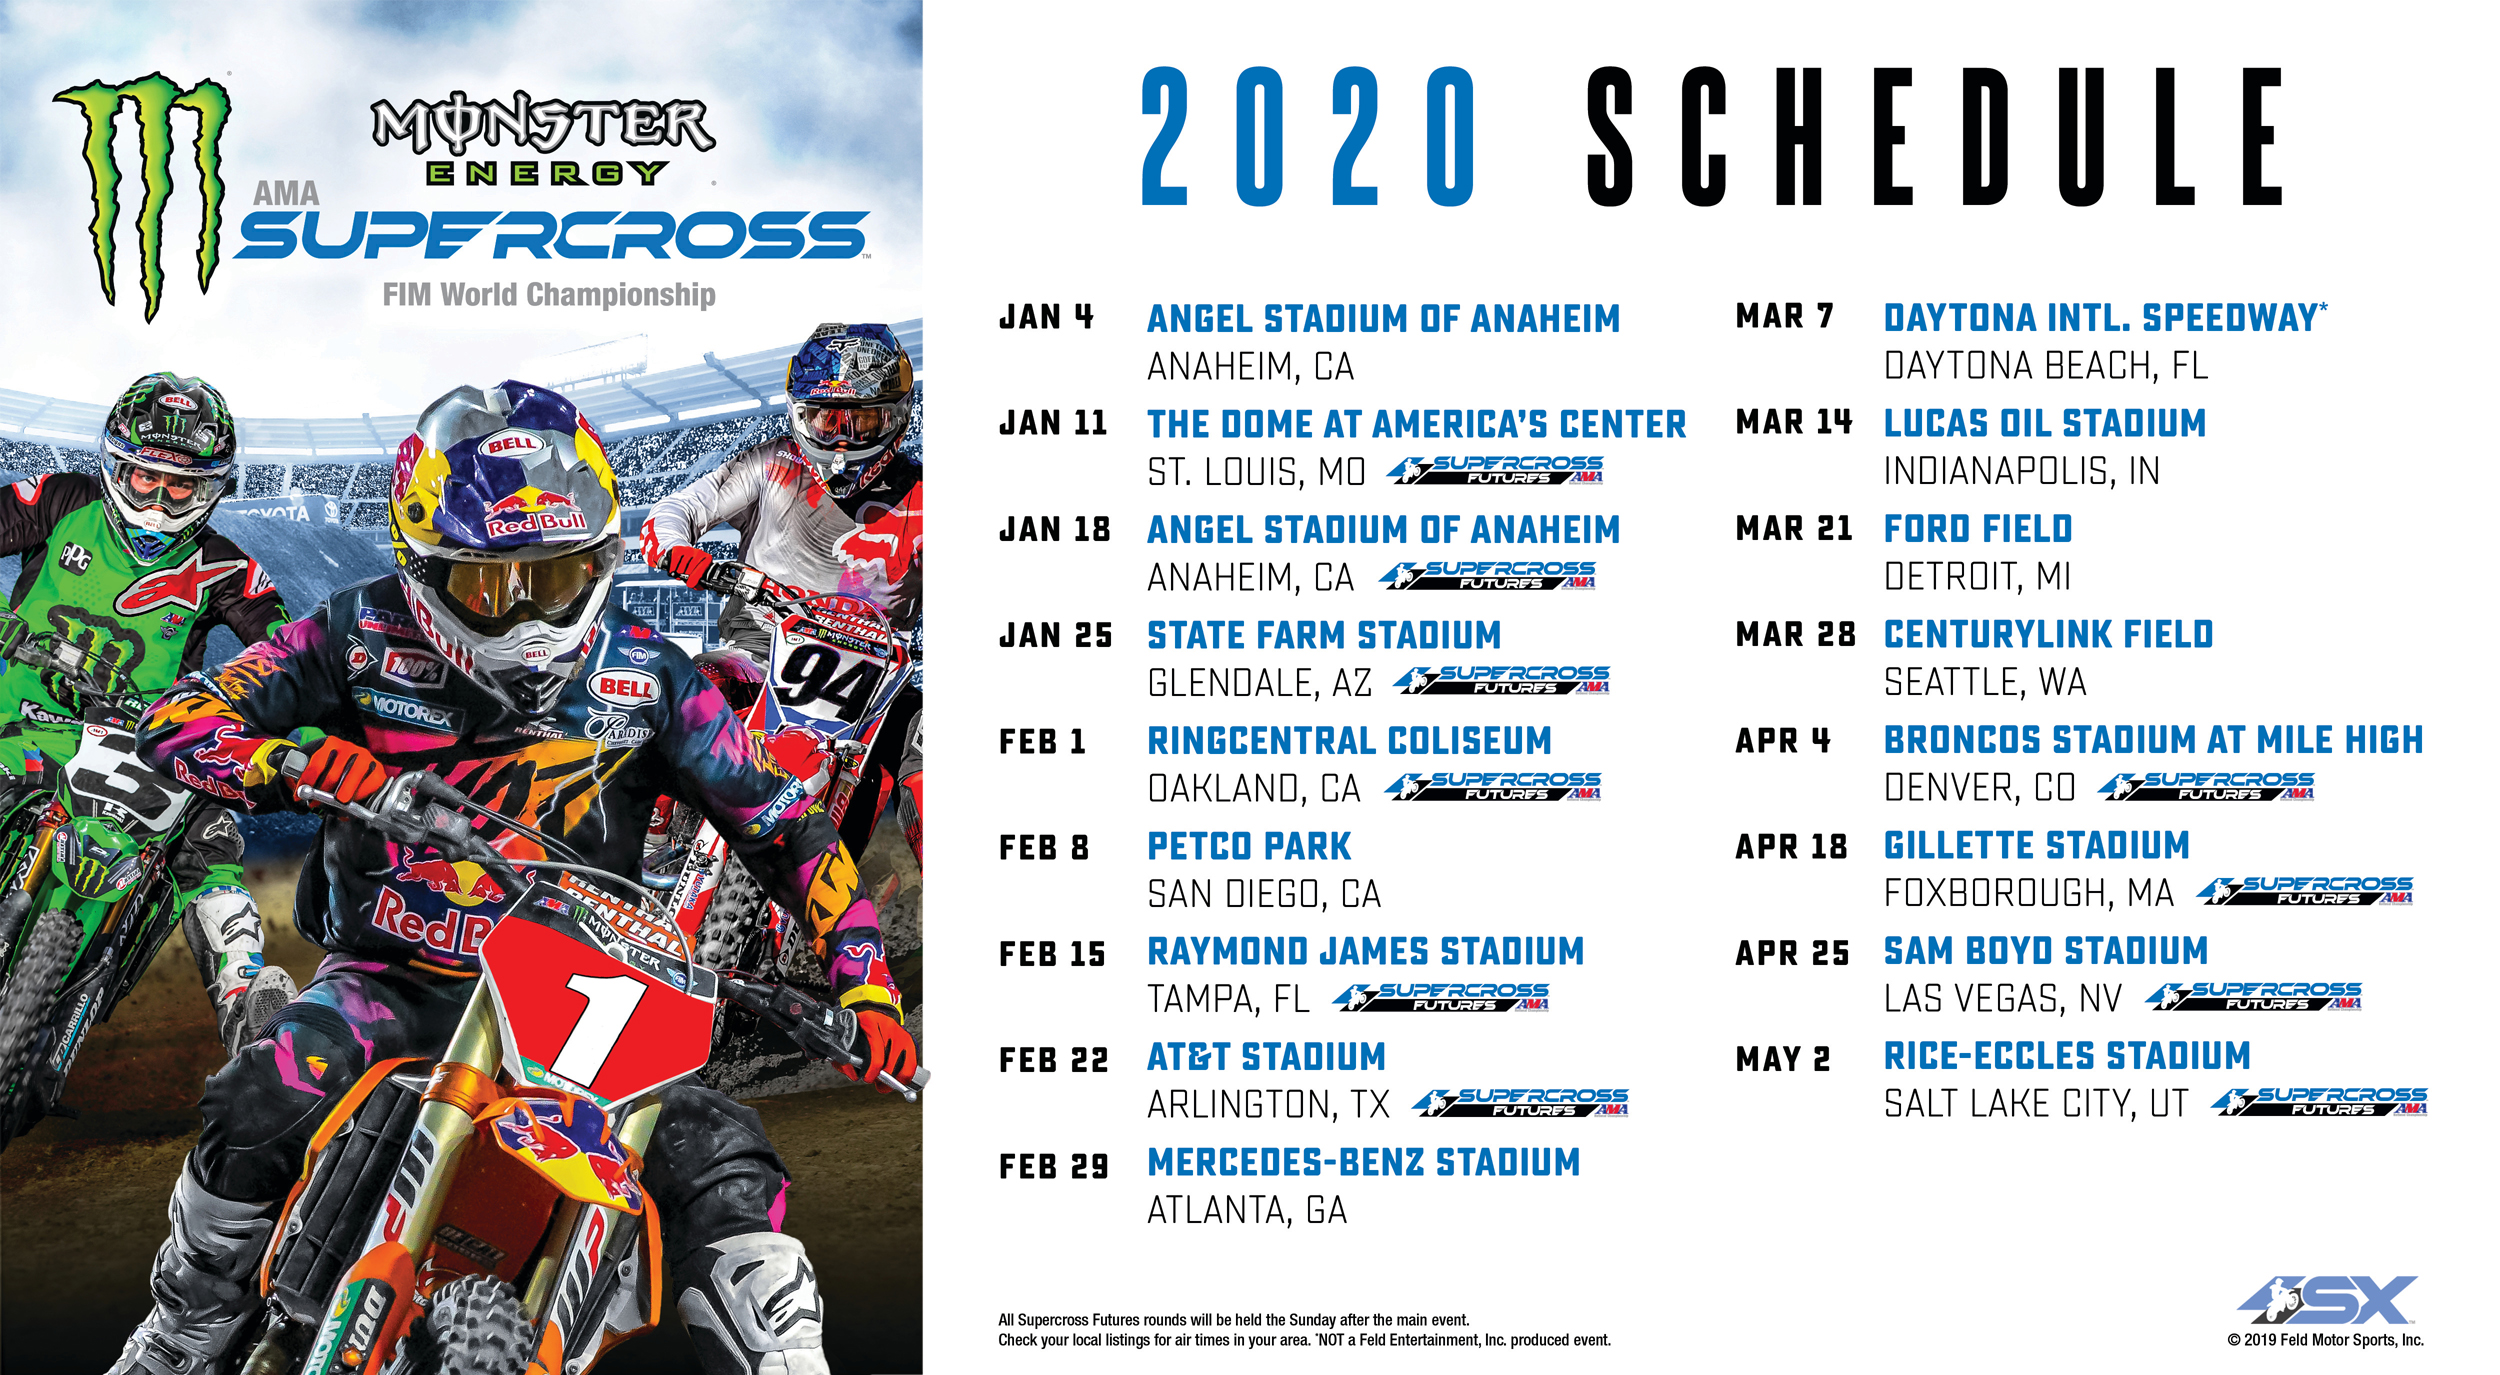 Monster Energy Supercross 2020 Race Schedule